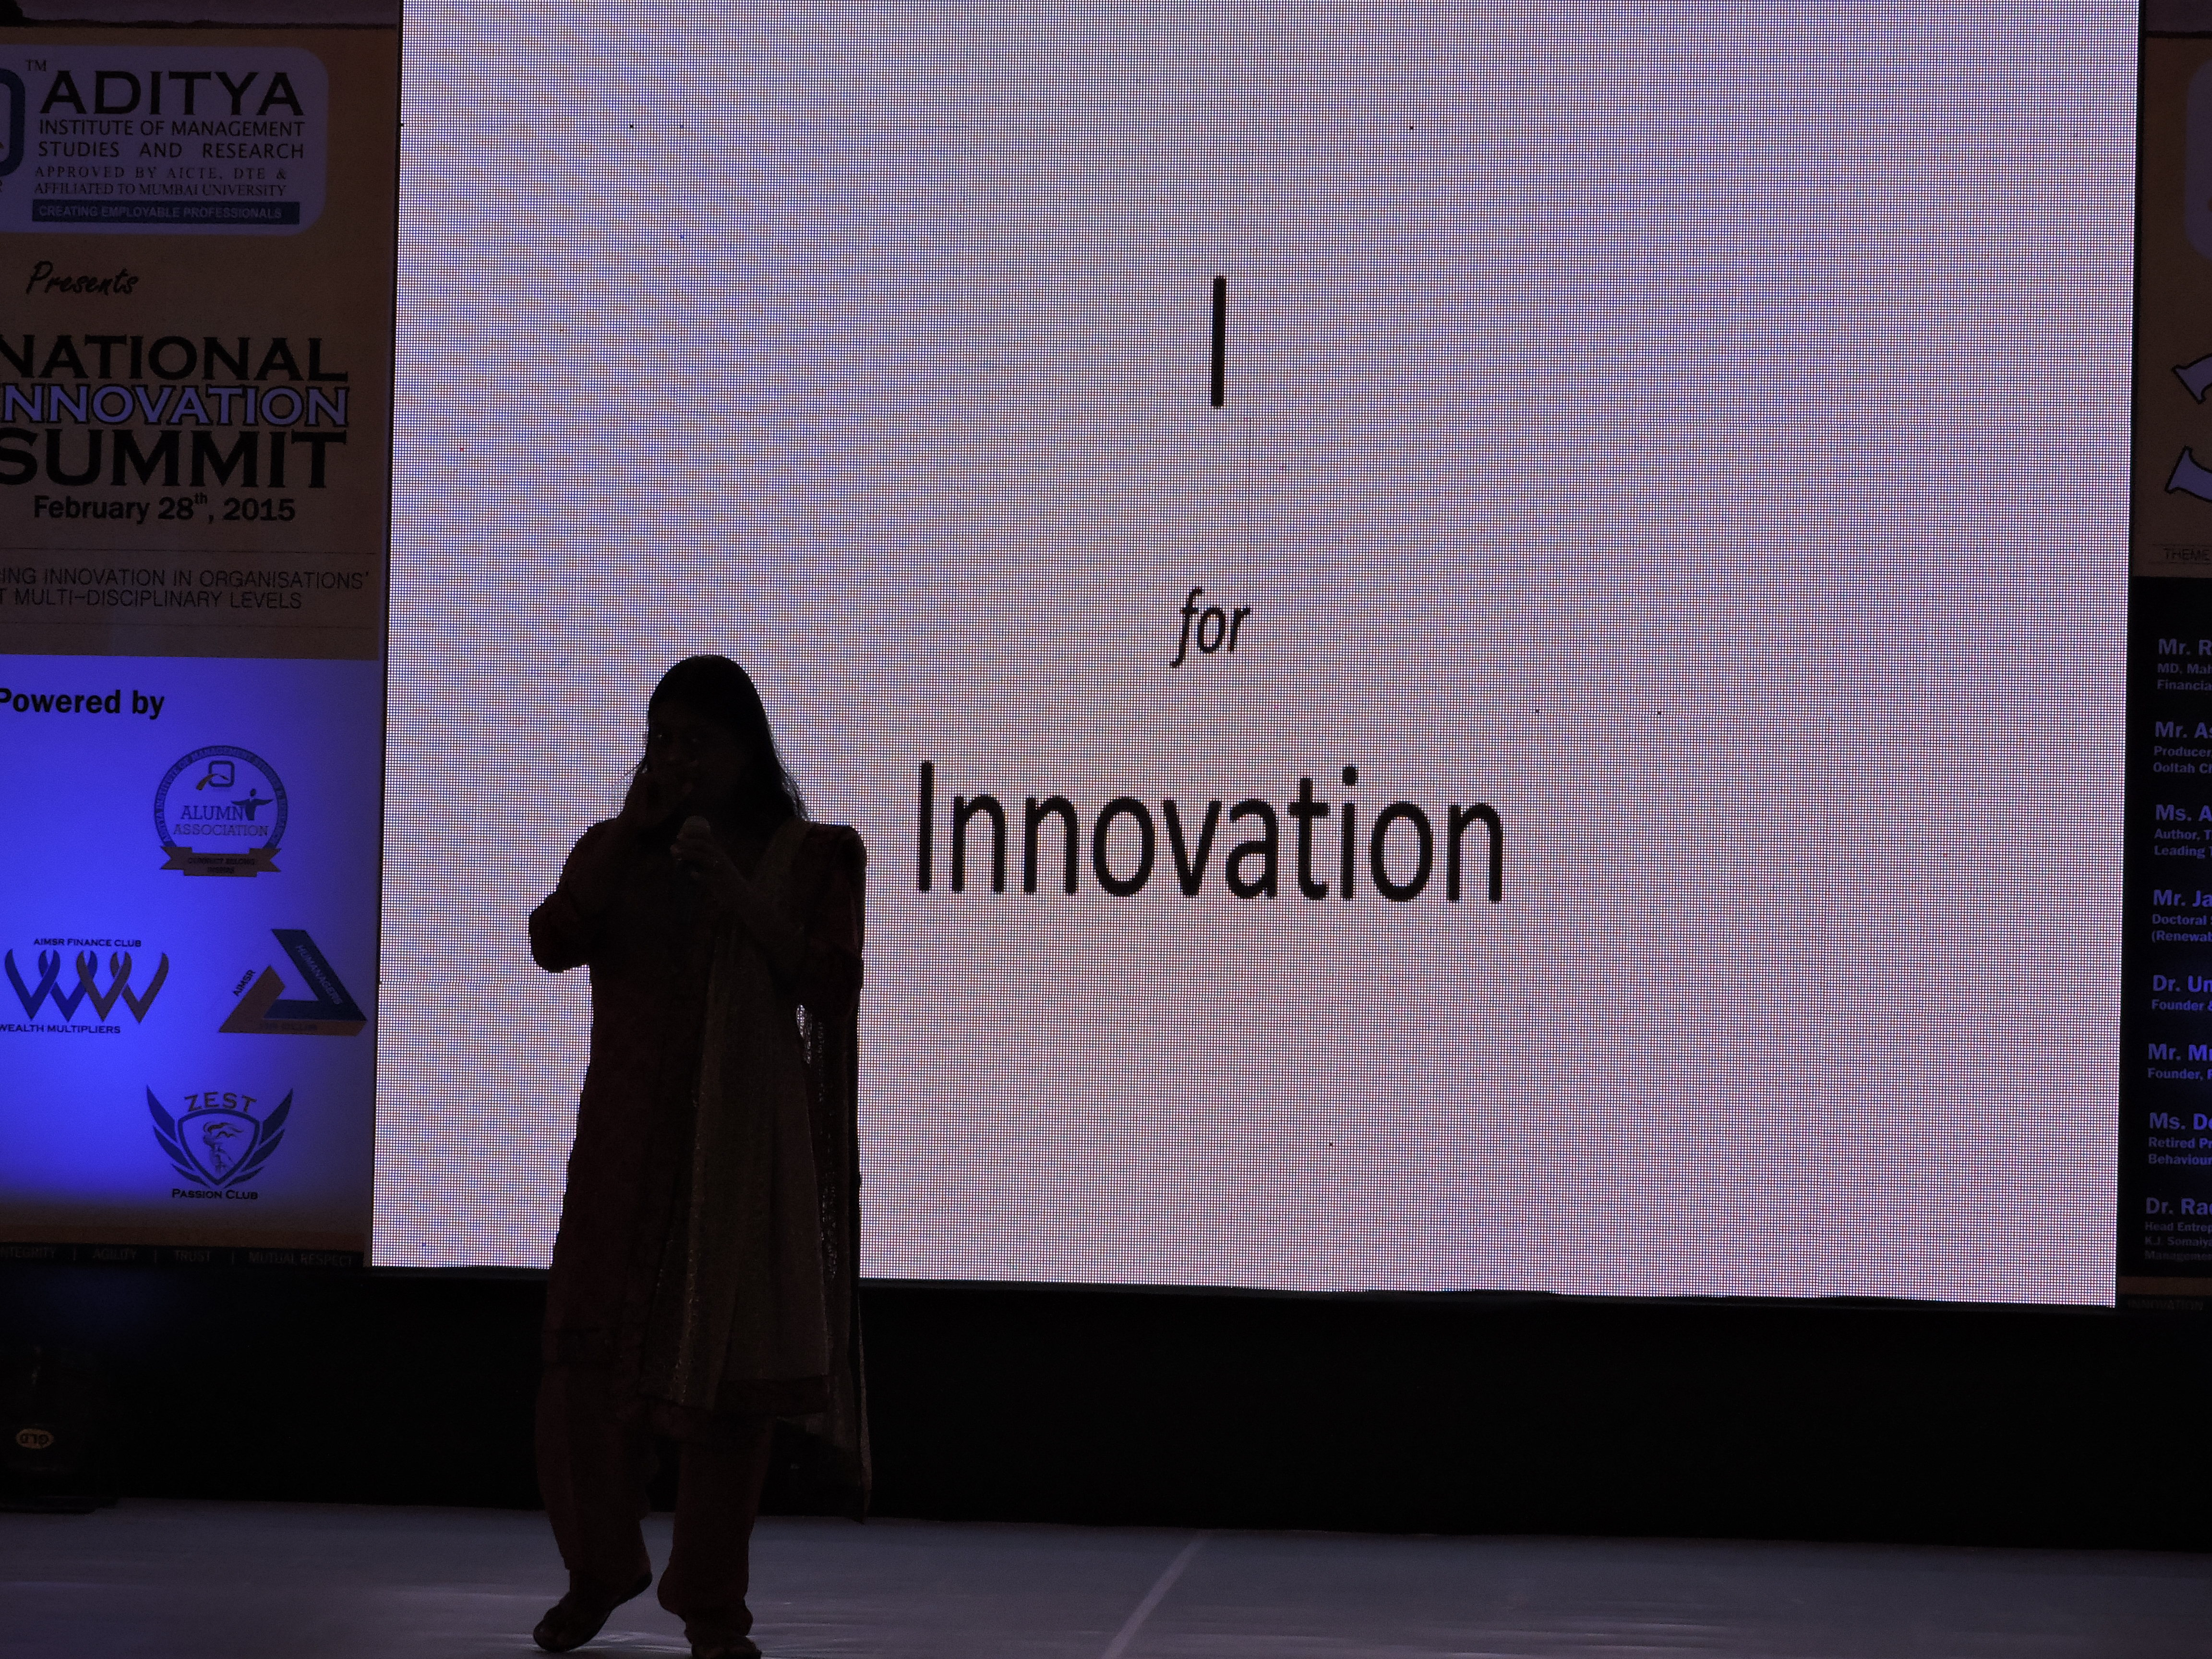 National Innovation Summit 2015